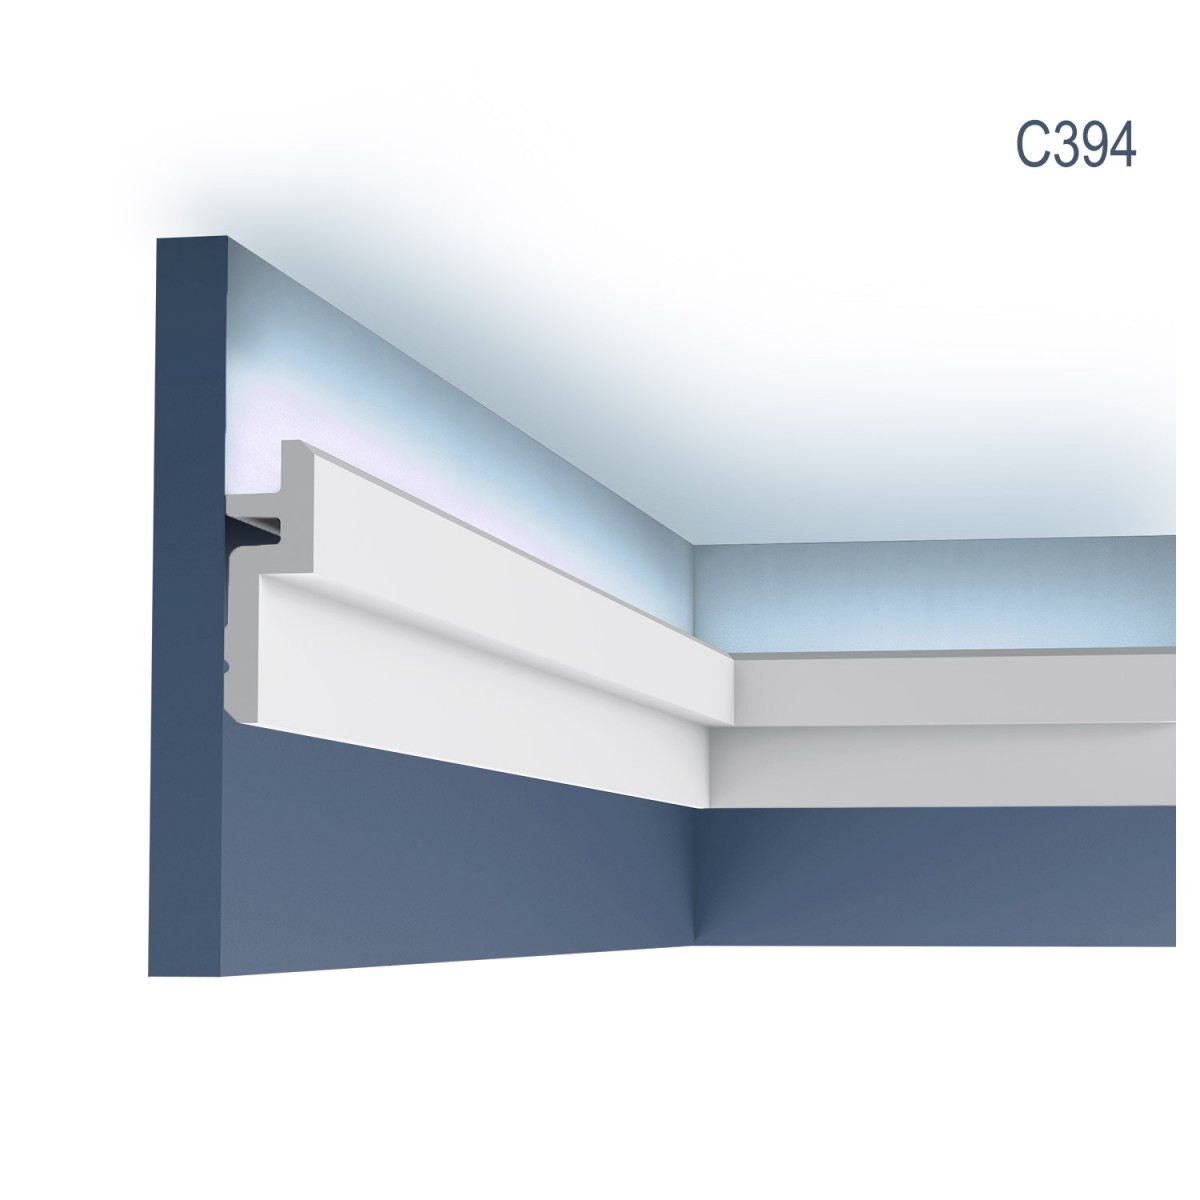 Scafa Modern C394, Dimensiuni: 200 X 9.5 X 3.1 cm, Orac Decor